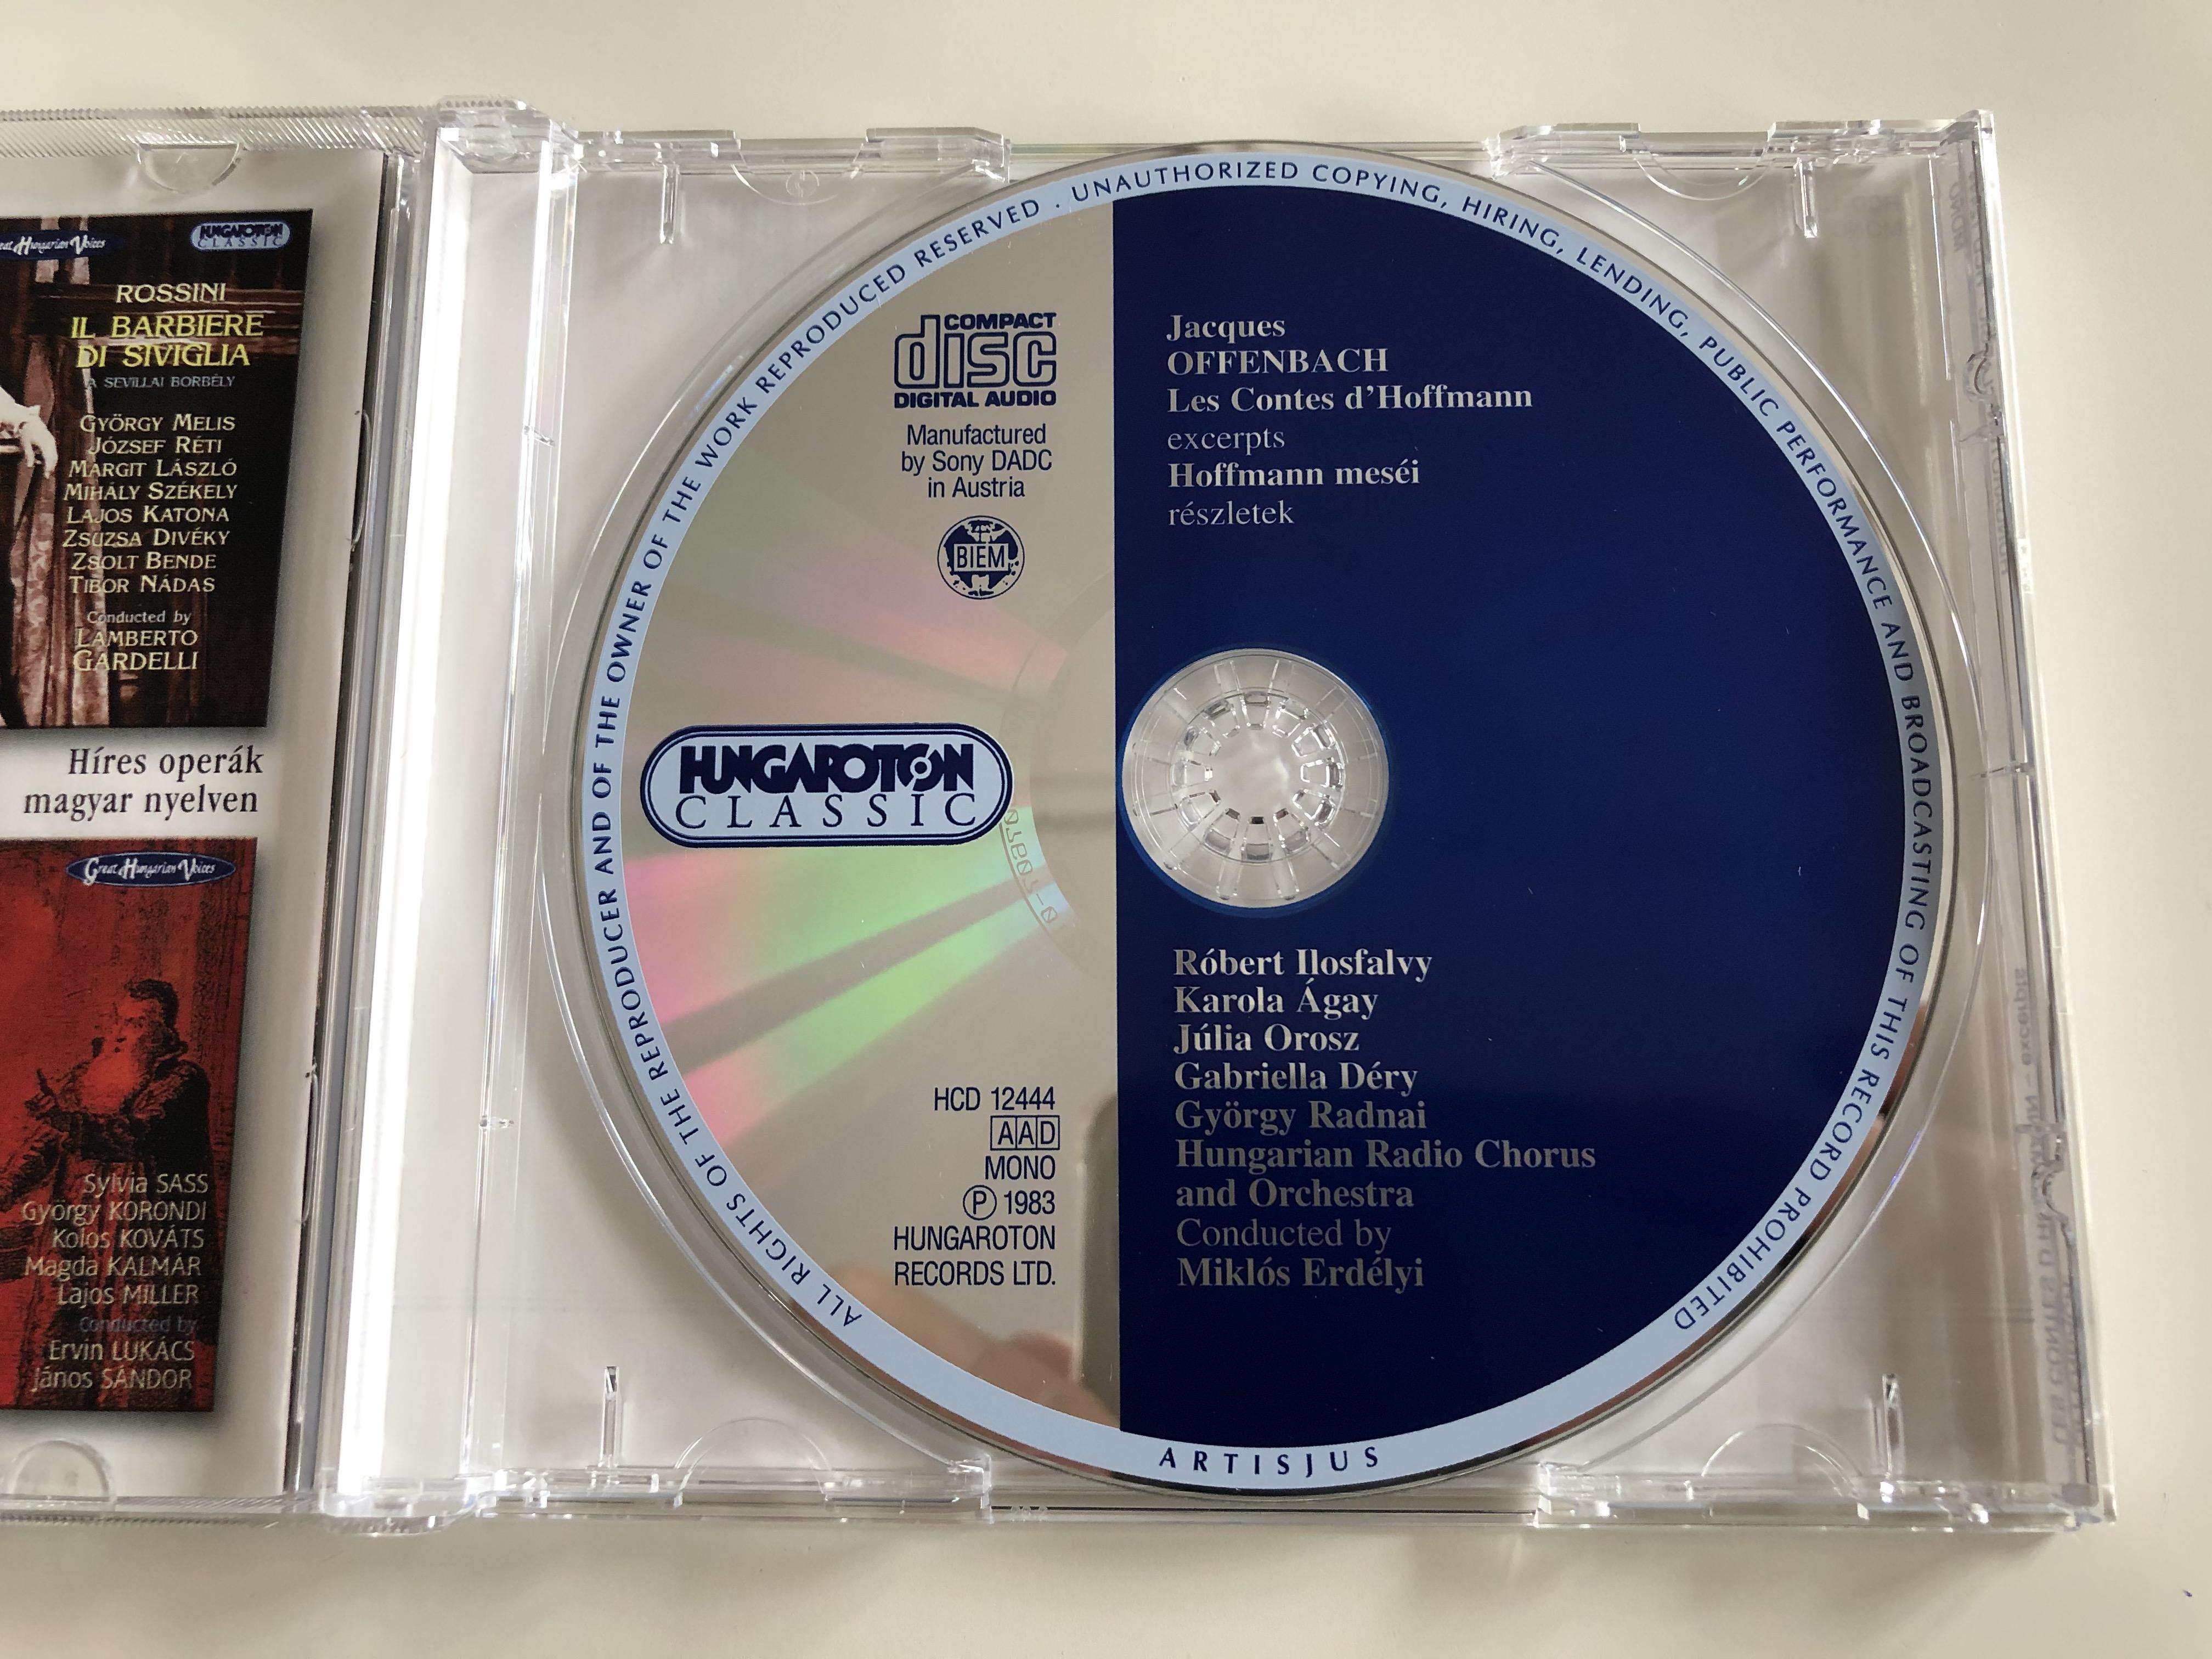 offenbach-les-contes-d-hoffmann-excerpts-hoffmann-mesei-reszletek-ilosfalvy-agay-orosz-dery-radnai-conducted-by-erdelyi-hungaroton-classic-audio-cd-1983-mono-hcd-12444-5-.jpg